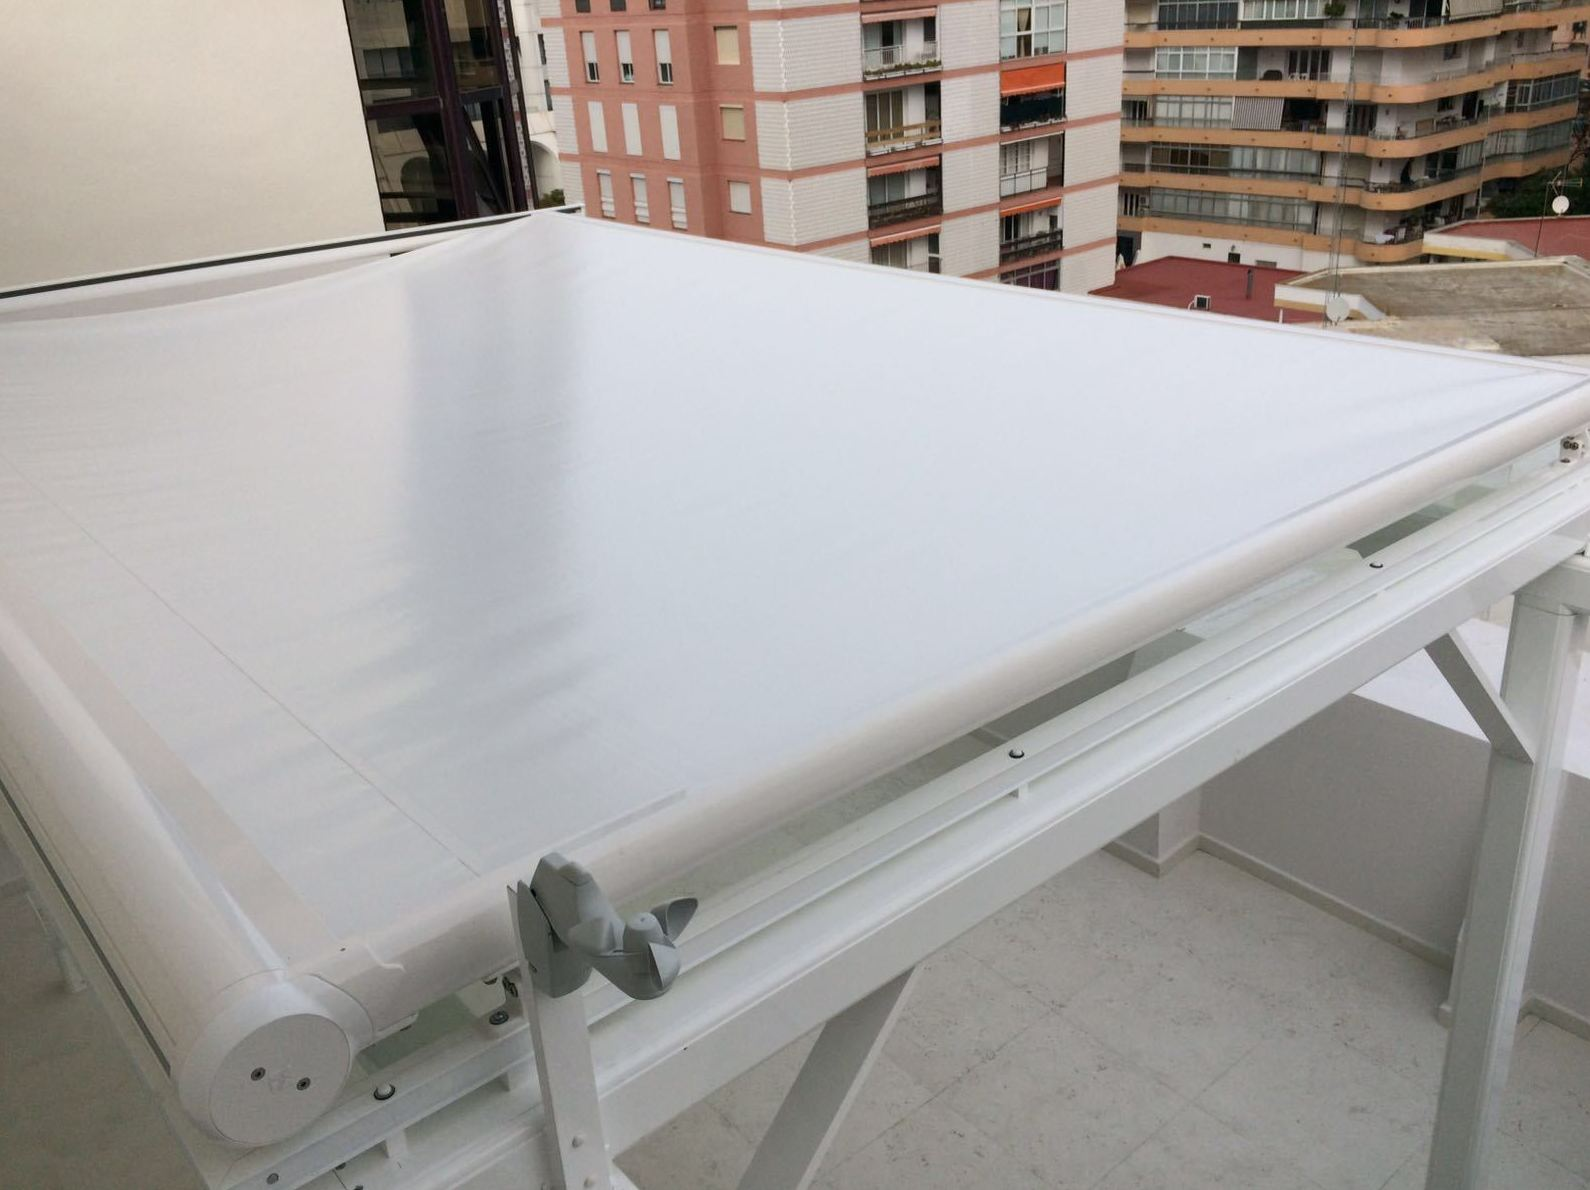 Pergola de Aluminio, vidrio laminar y toldo con motor y mando a distancia Aluminios Aludecor